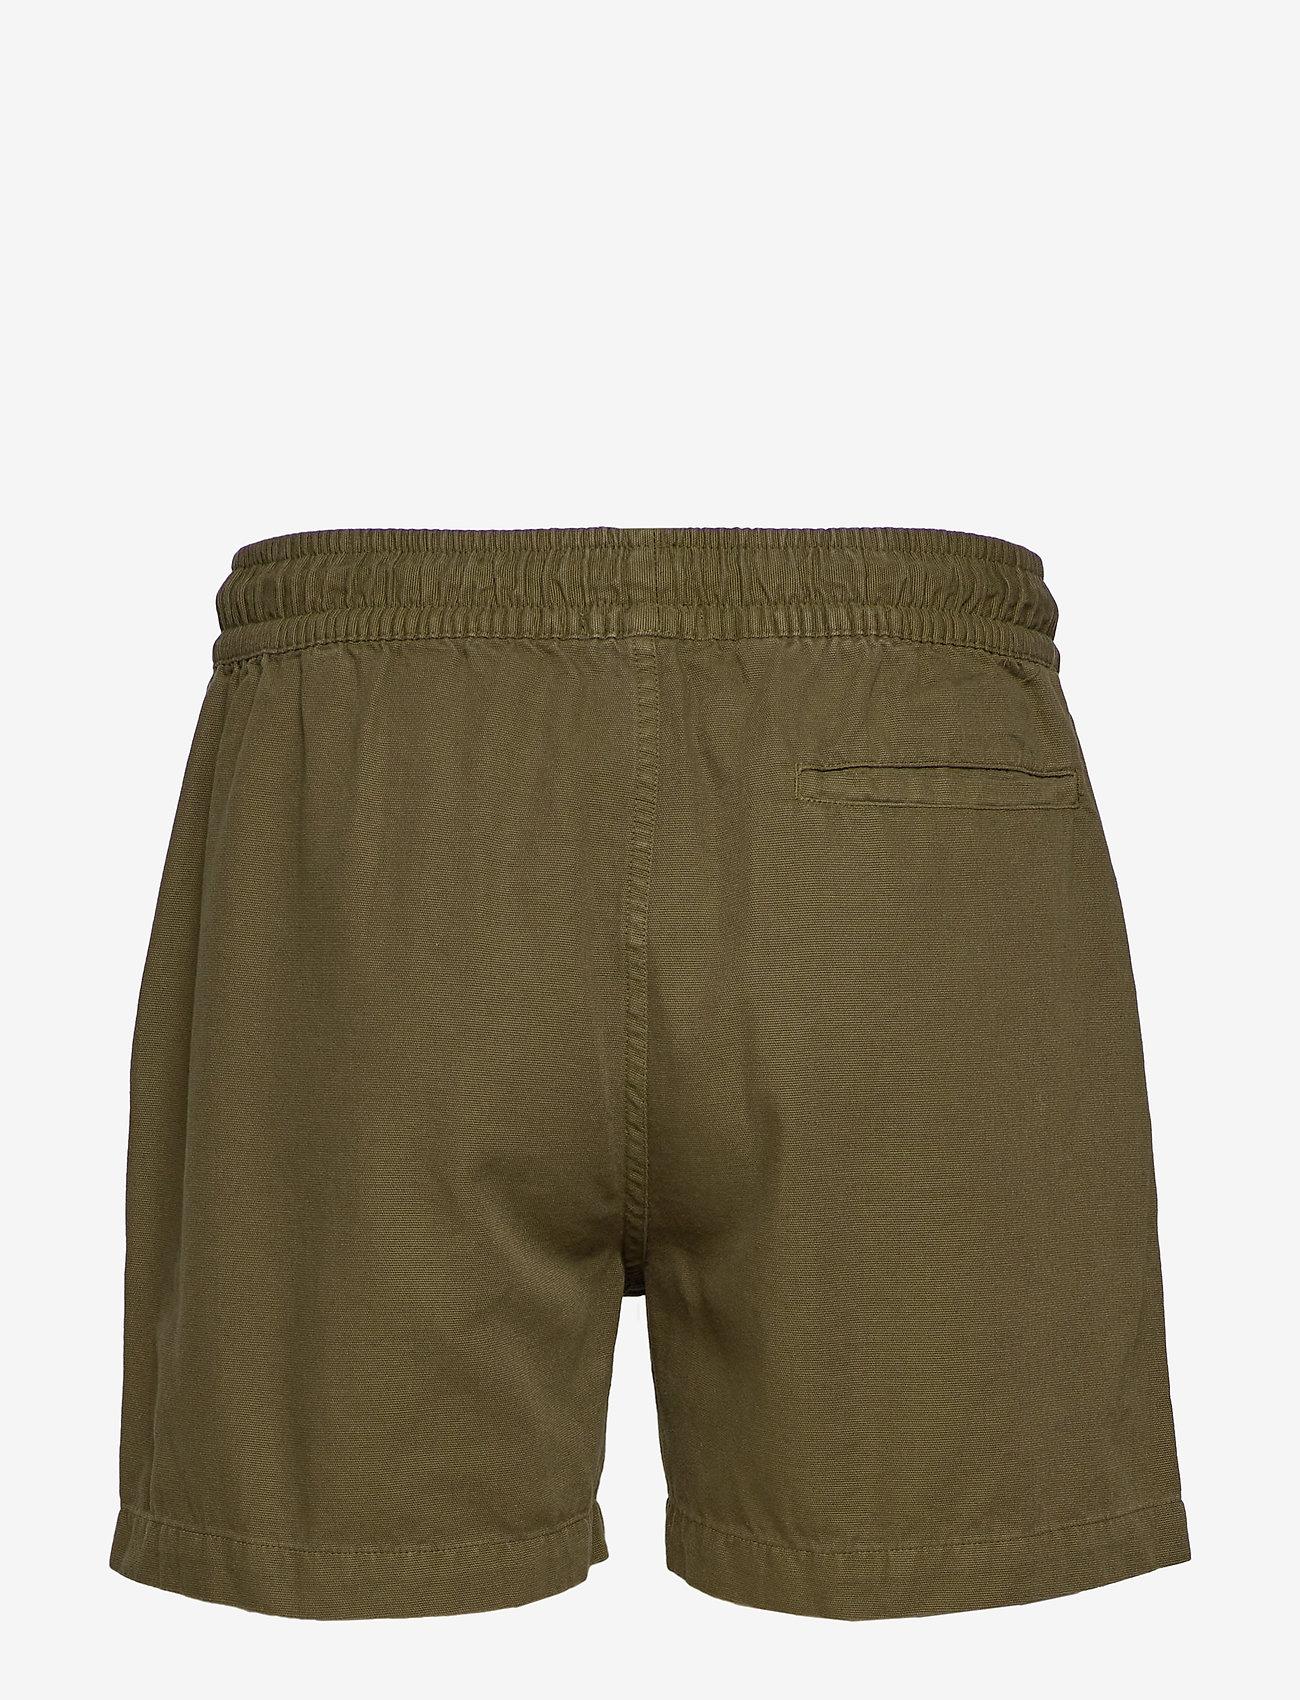 Forét Home Shorts - Black